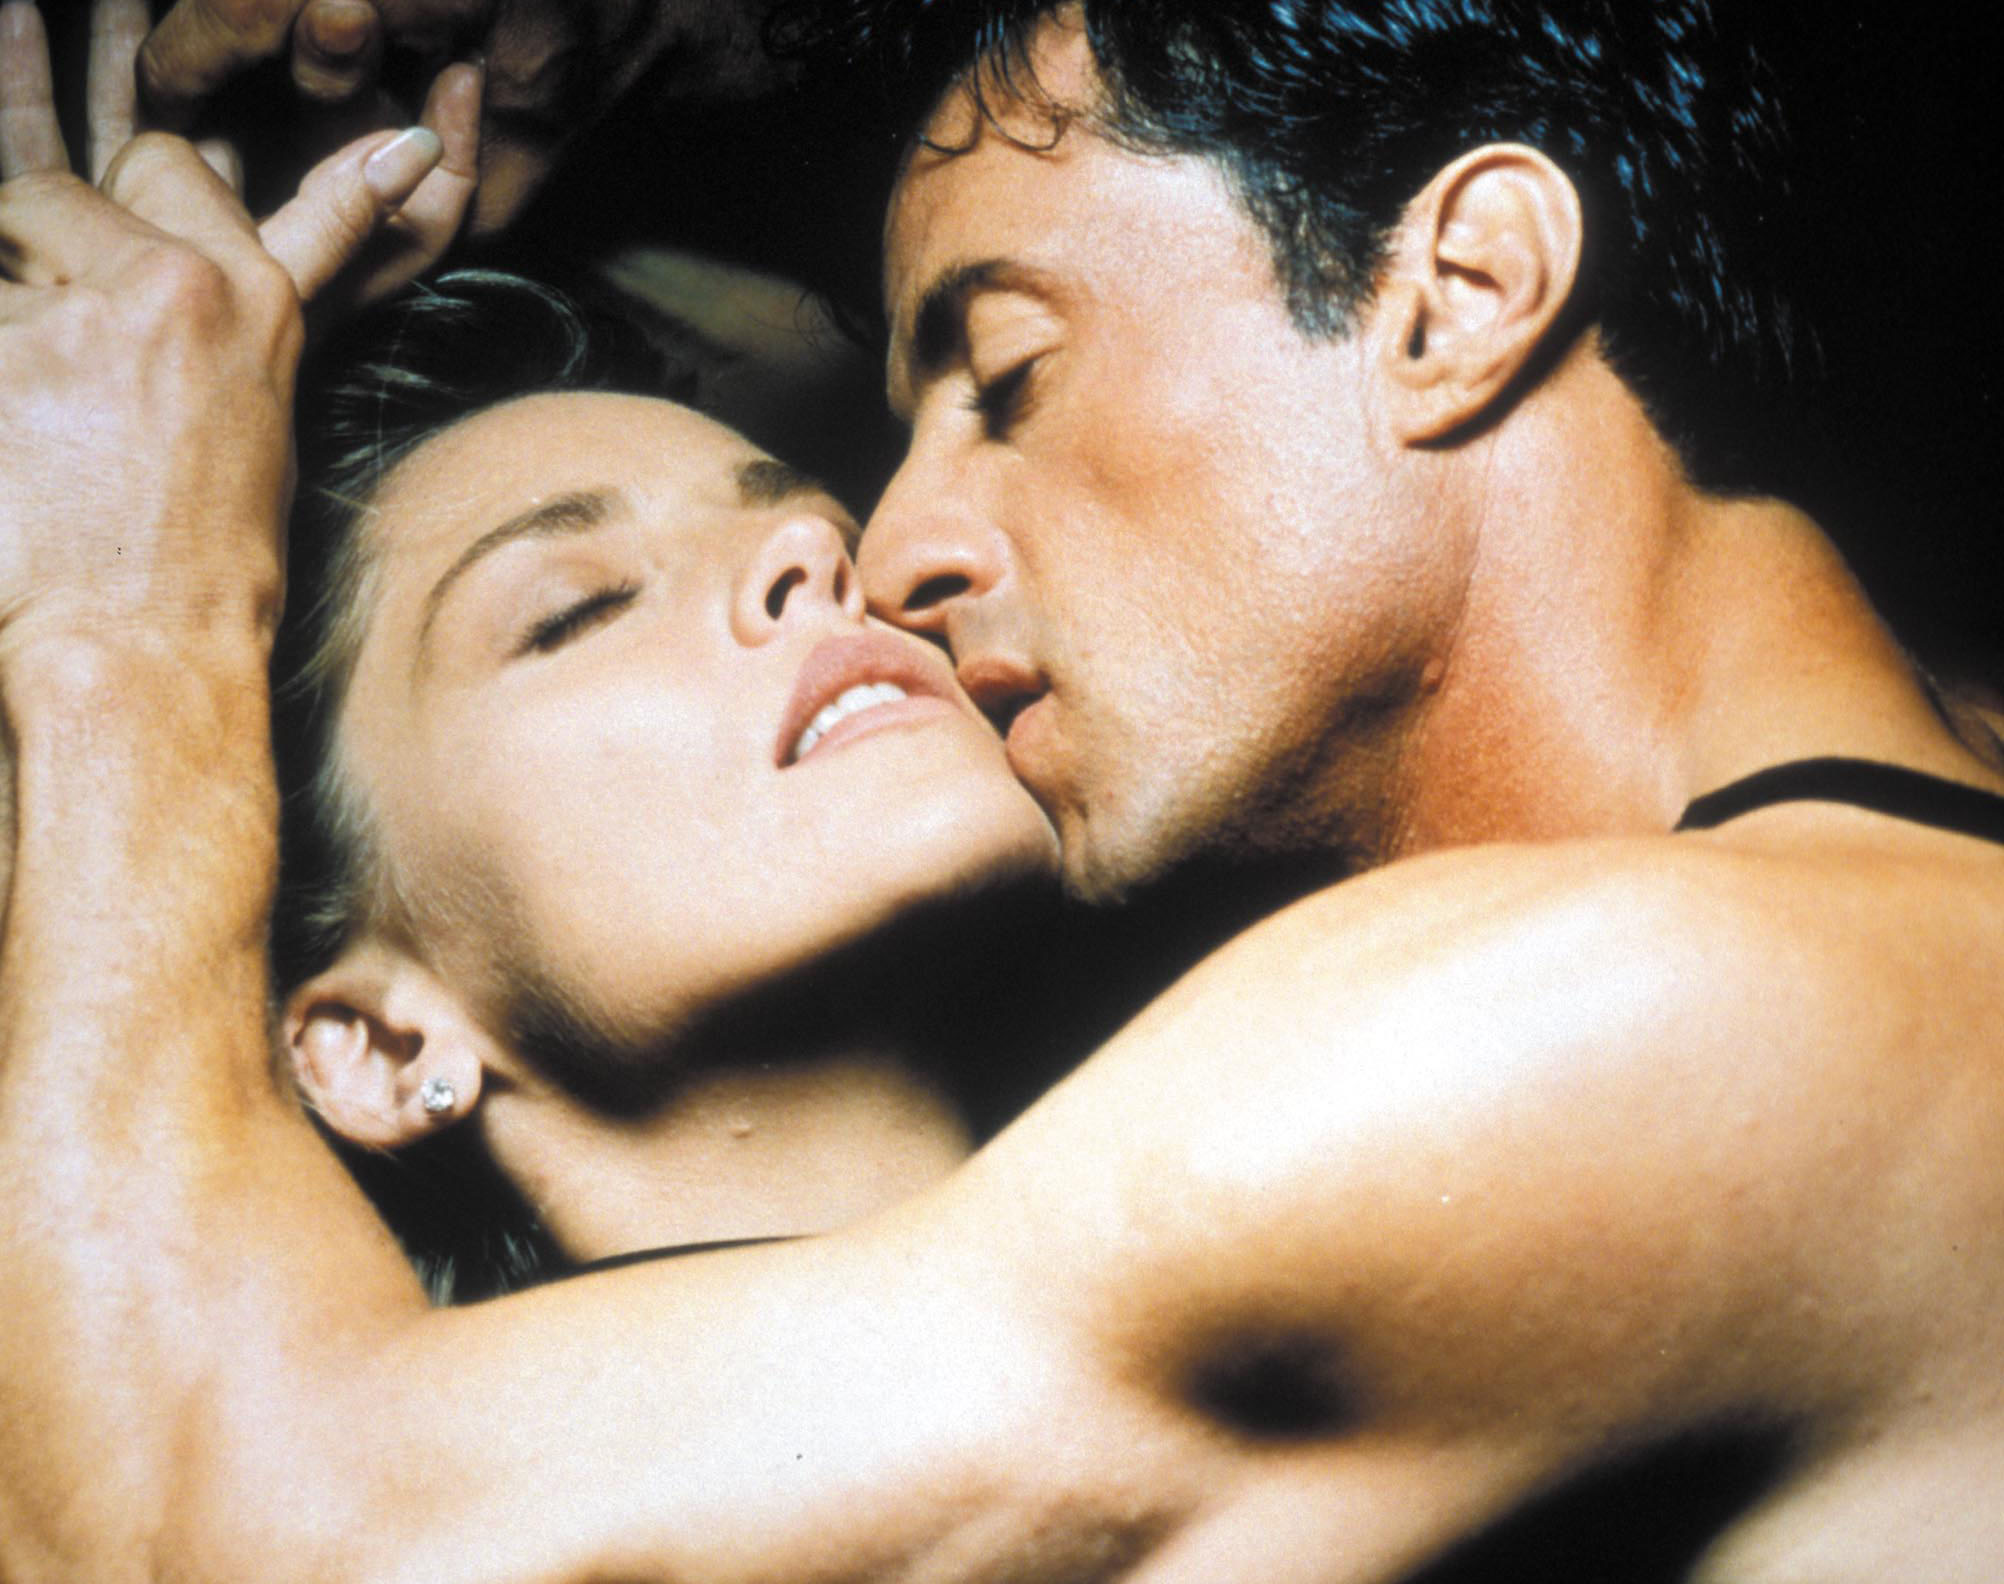 film thriller erotico foto sexy sesso